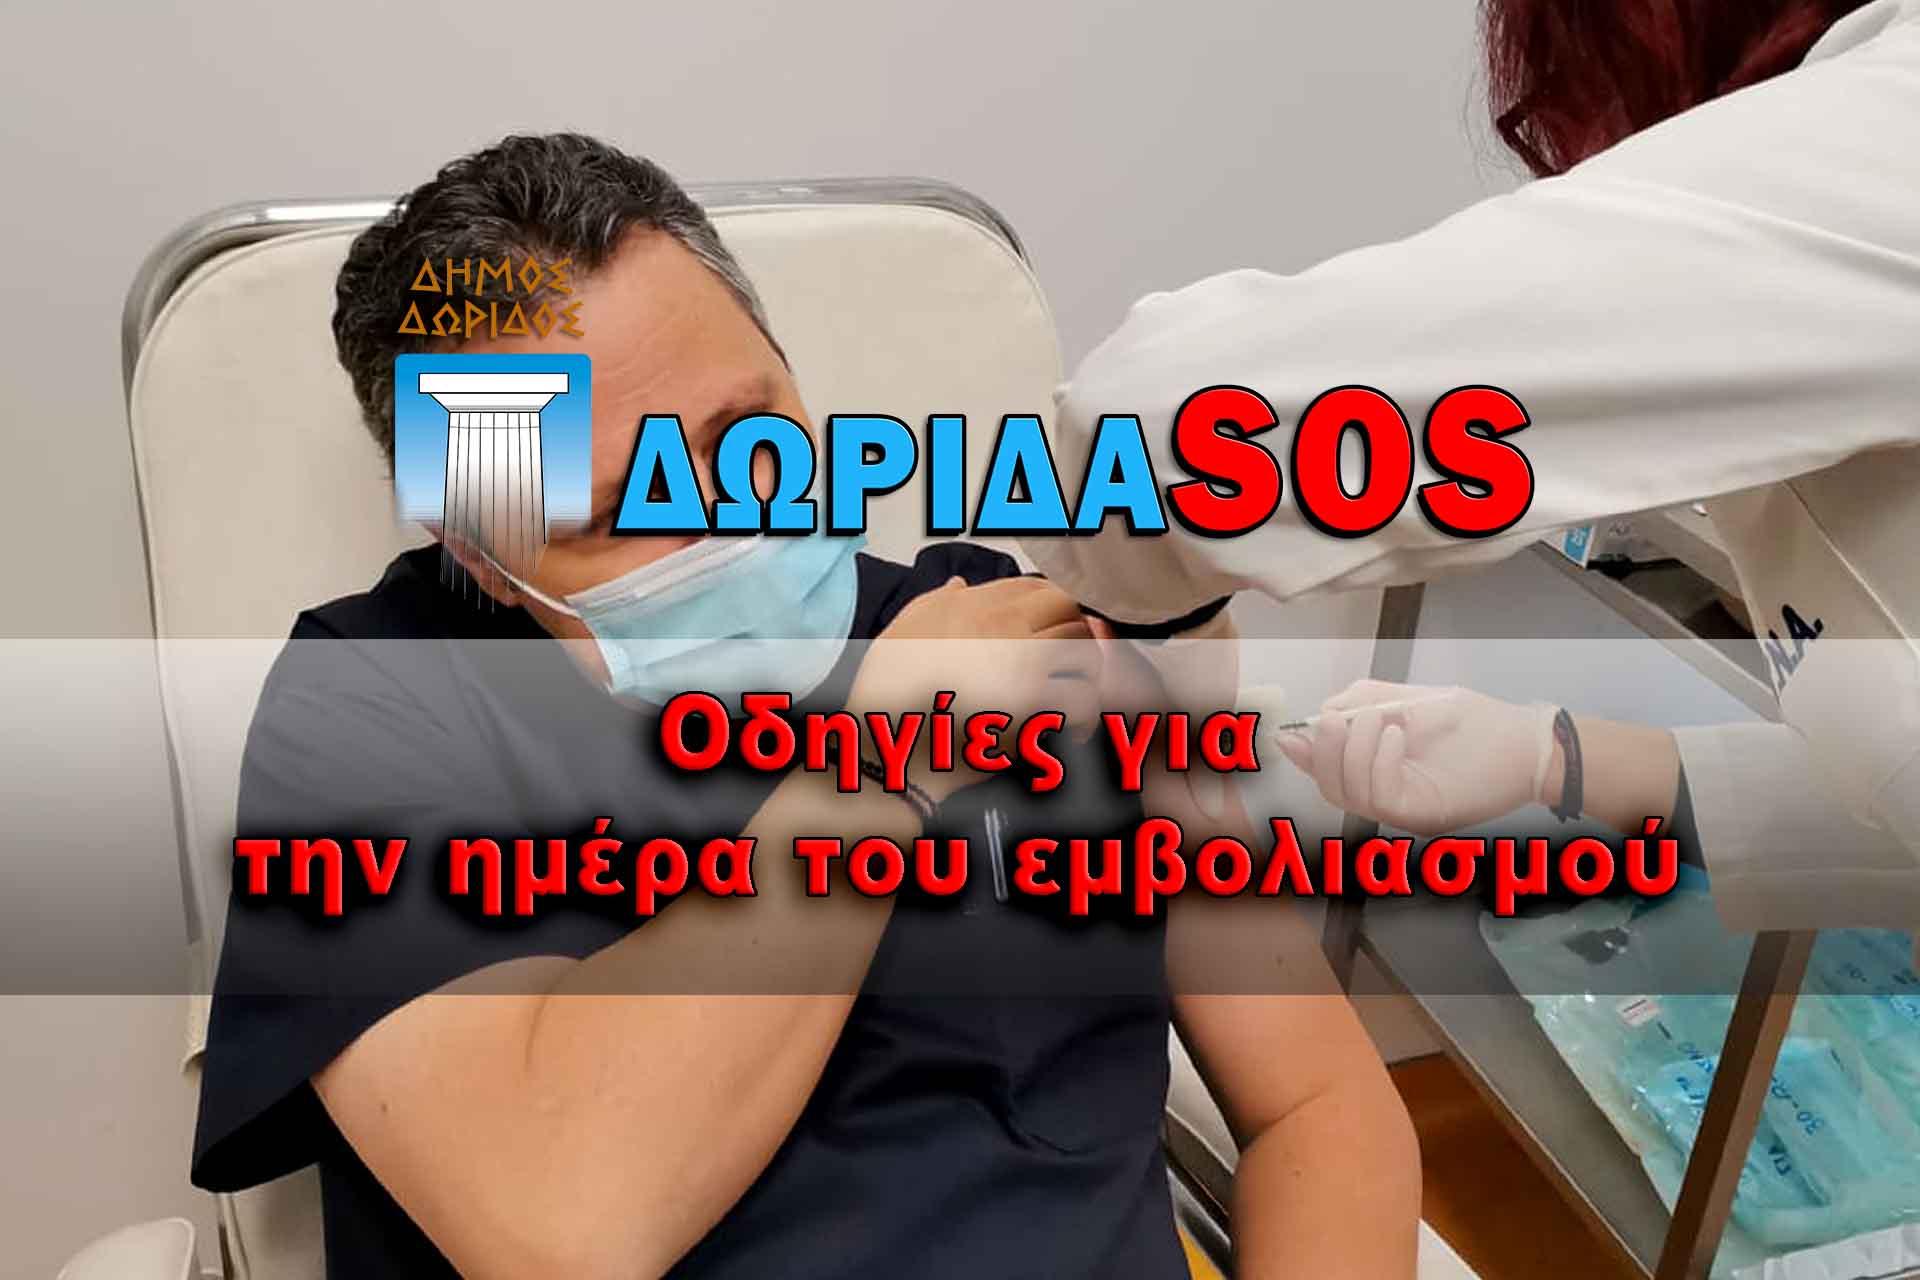 Dorida SOS Οδηγίες για την ημέρα του εμβολιασμού